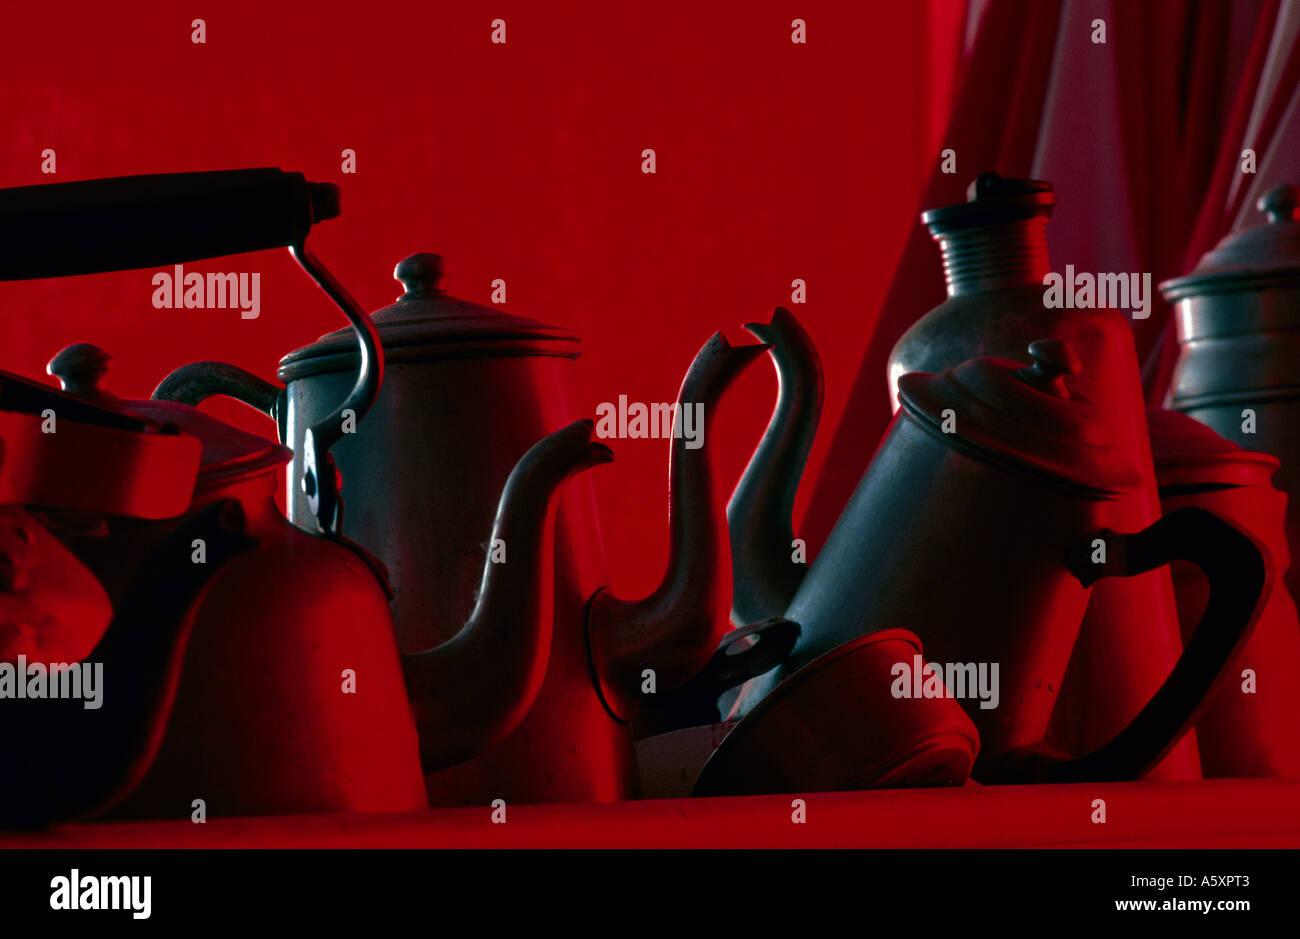 Collection d'ustensiles de cuisine en aluminium sur un fond rouge. Collection d'ustensiles en aluminium sur fond rouge Photo Stock